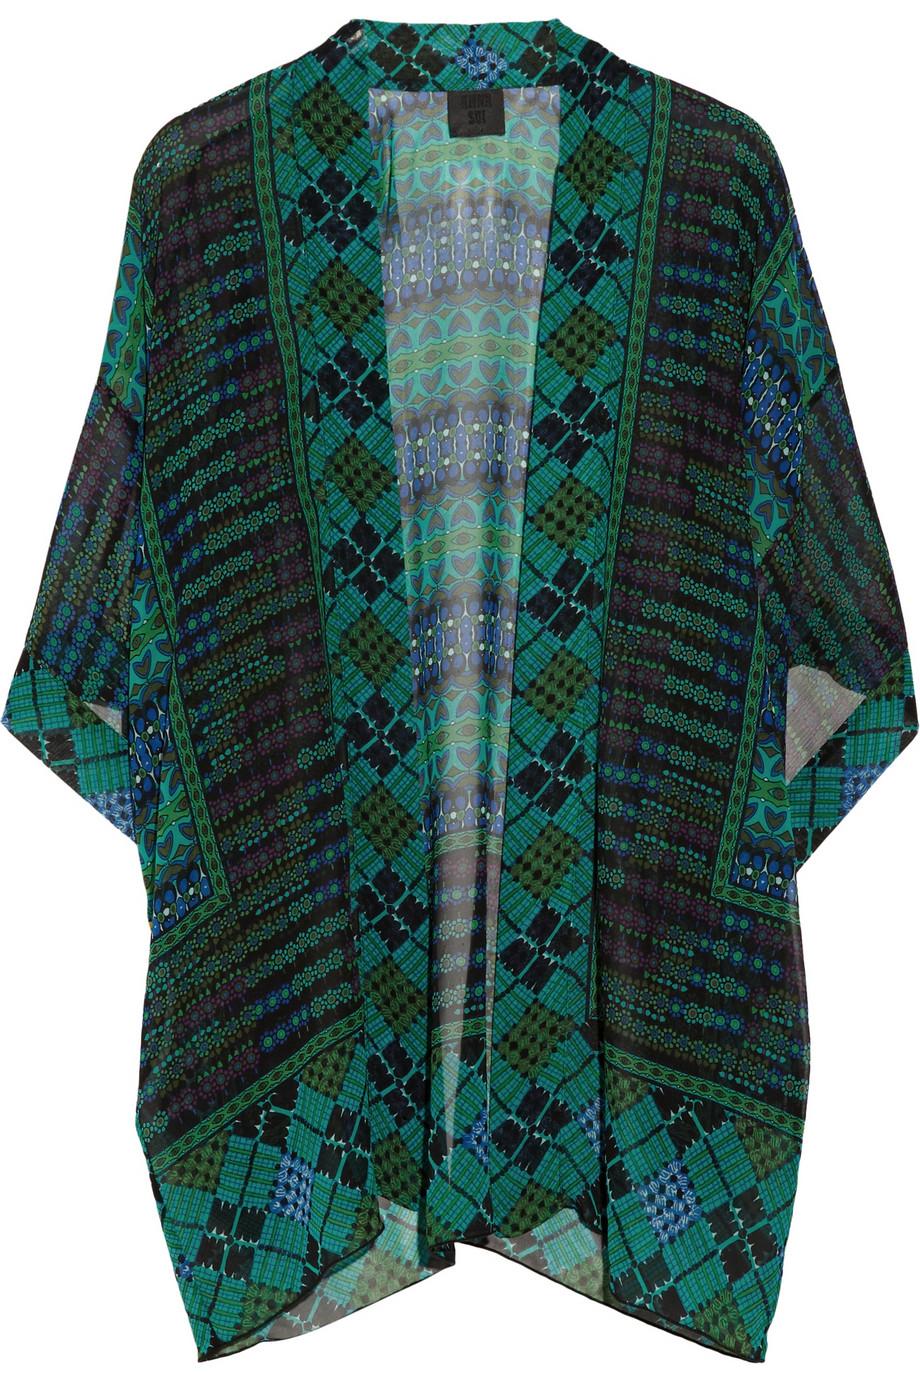 Anna Sui Printed Silk Georgette Kimono Style Jacket In